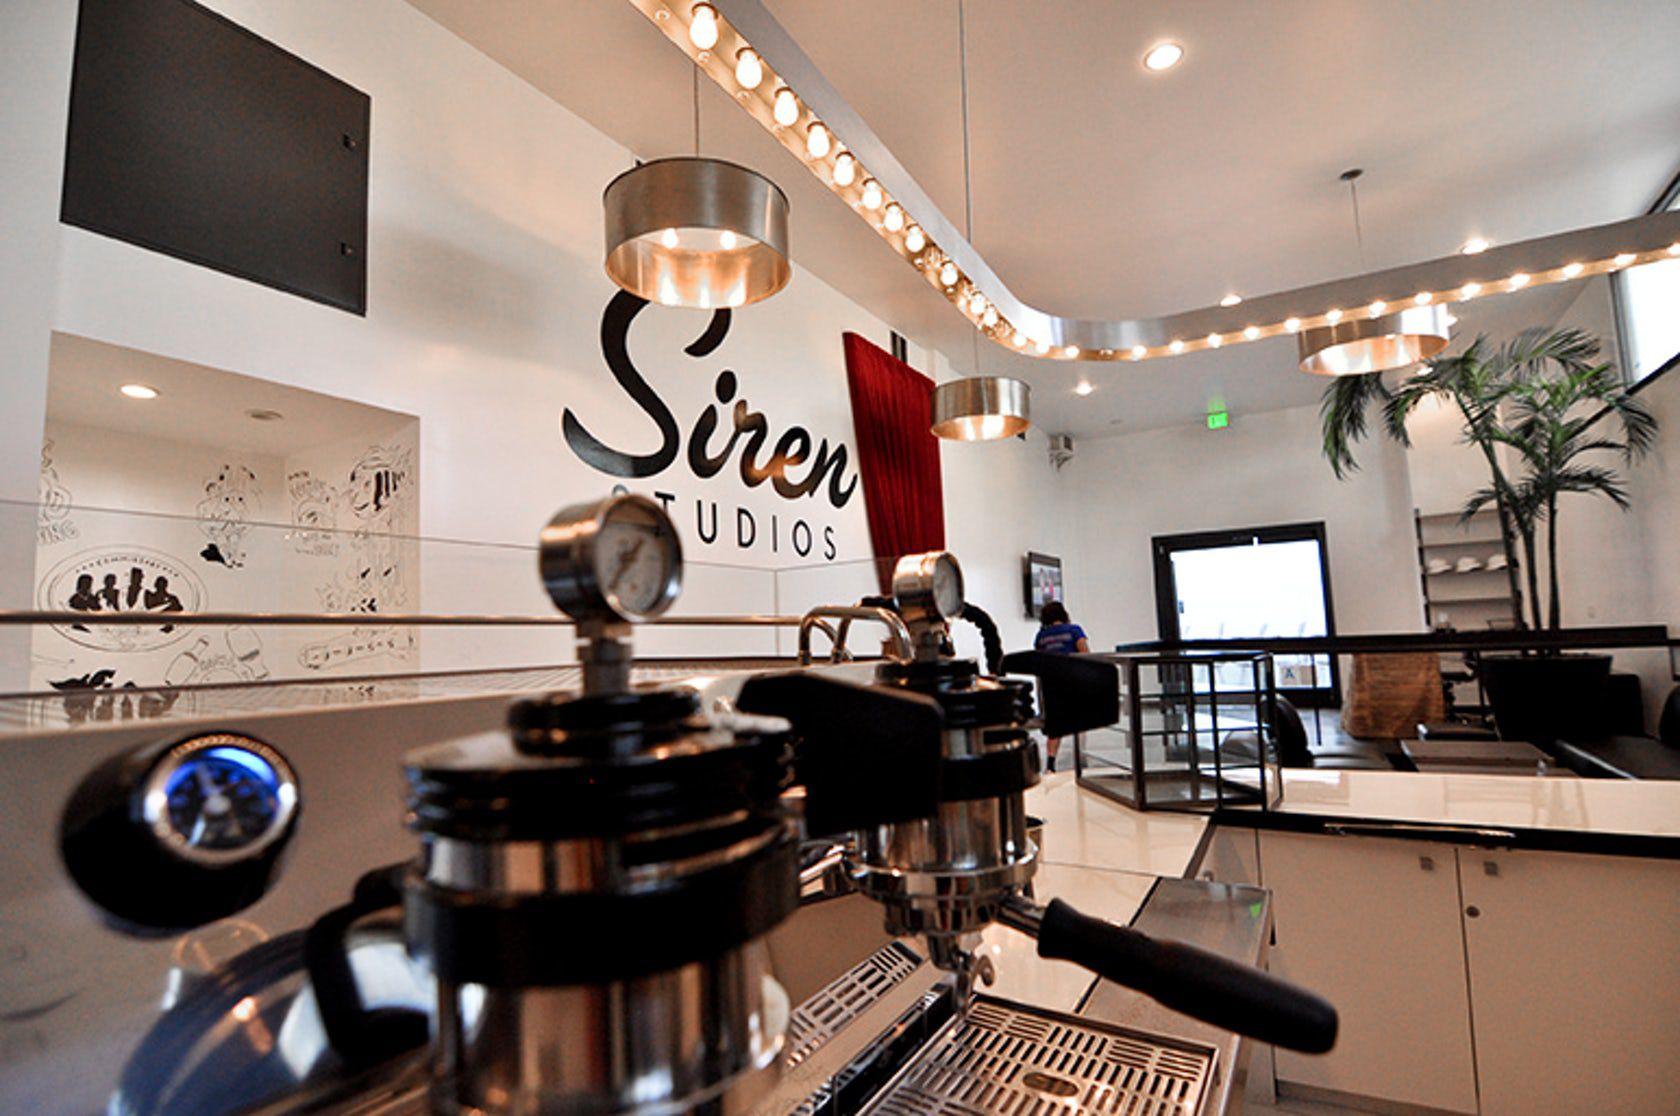 Coffee Commissary quan cafe espresso nho don gian 2018